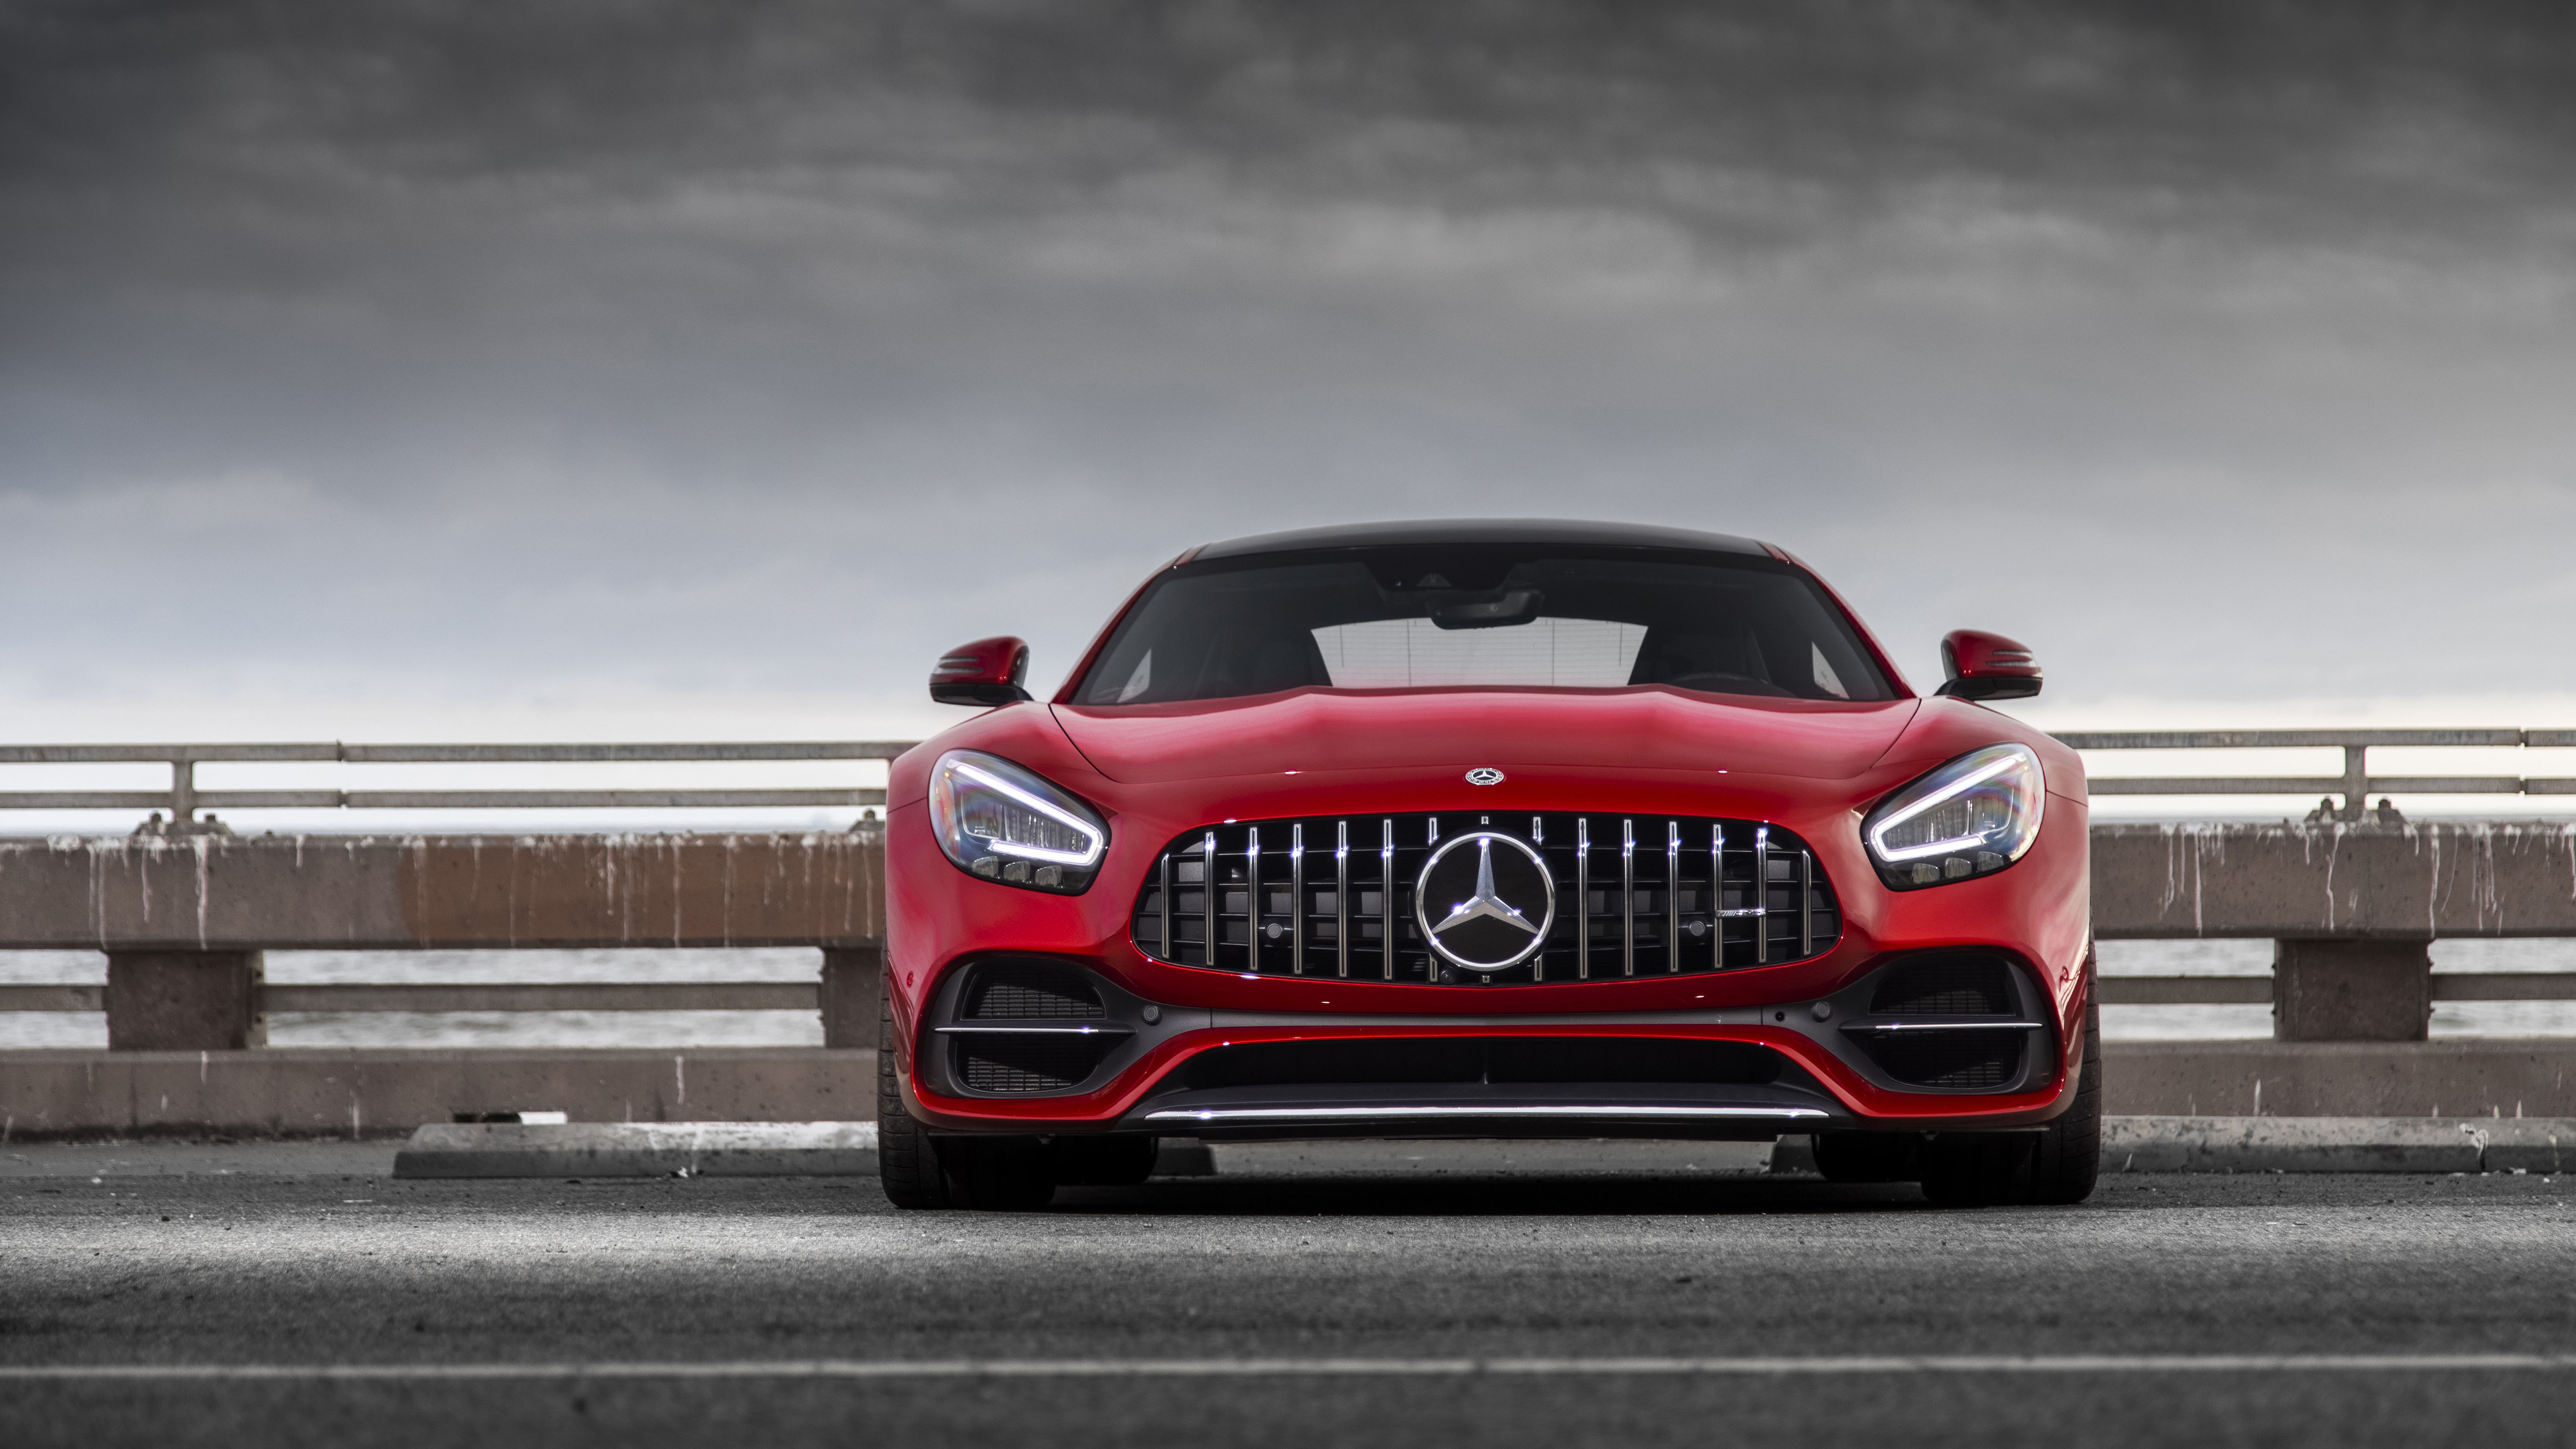 2020 Mercedes-AMG GT C 2019 4K